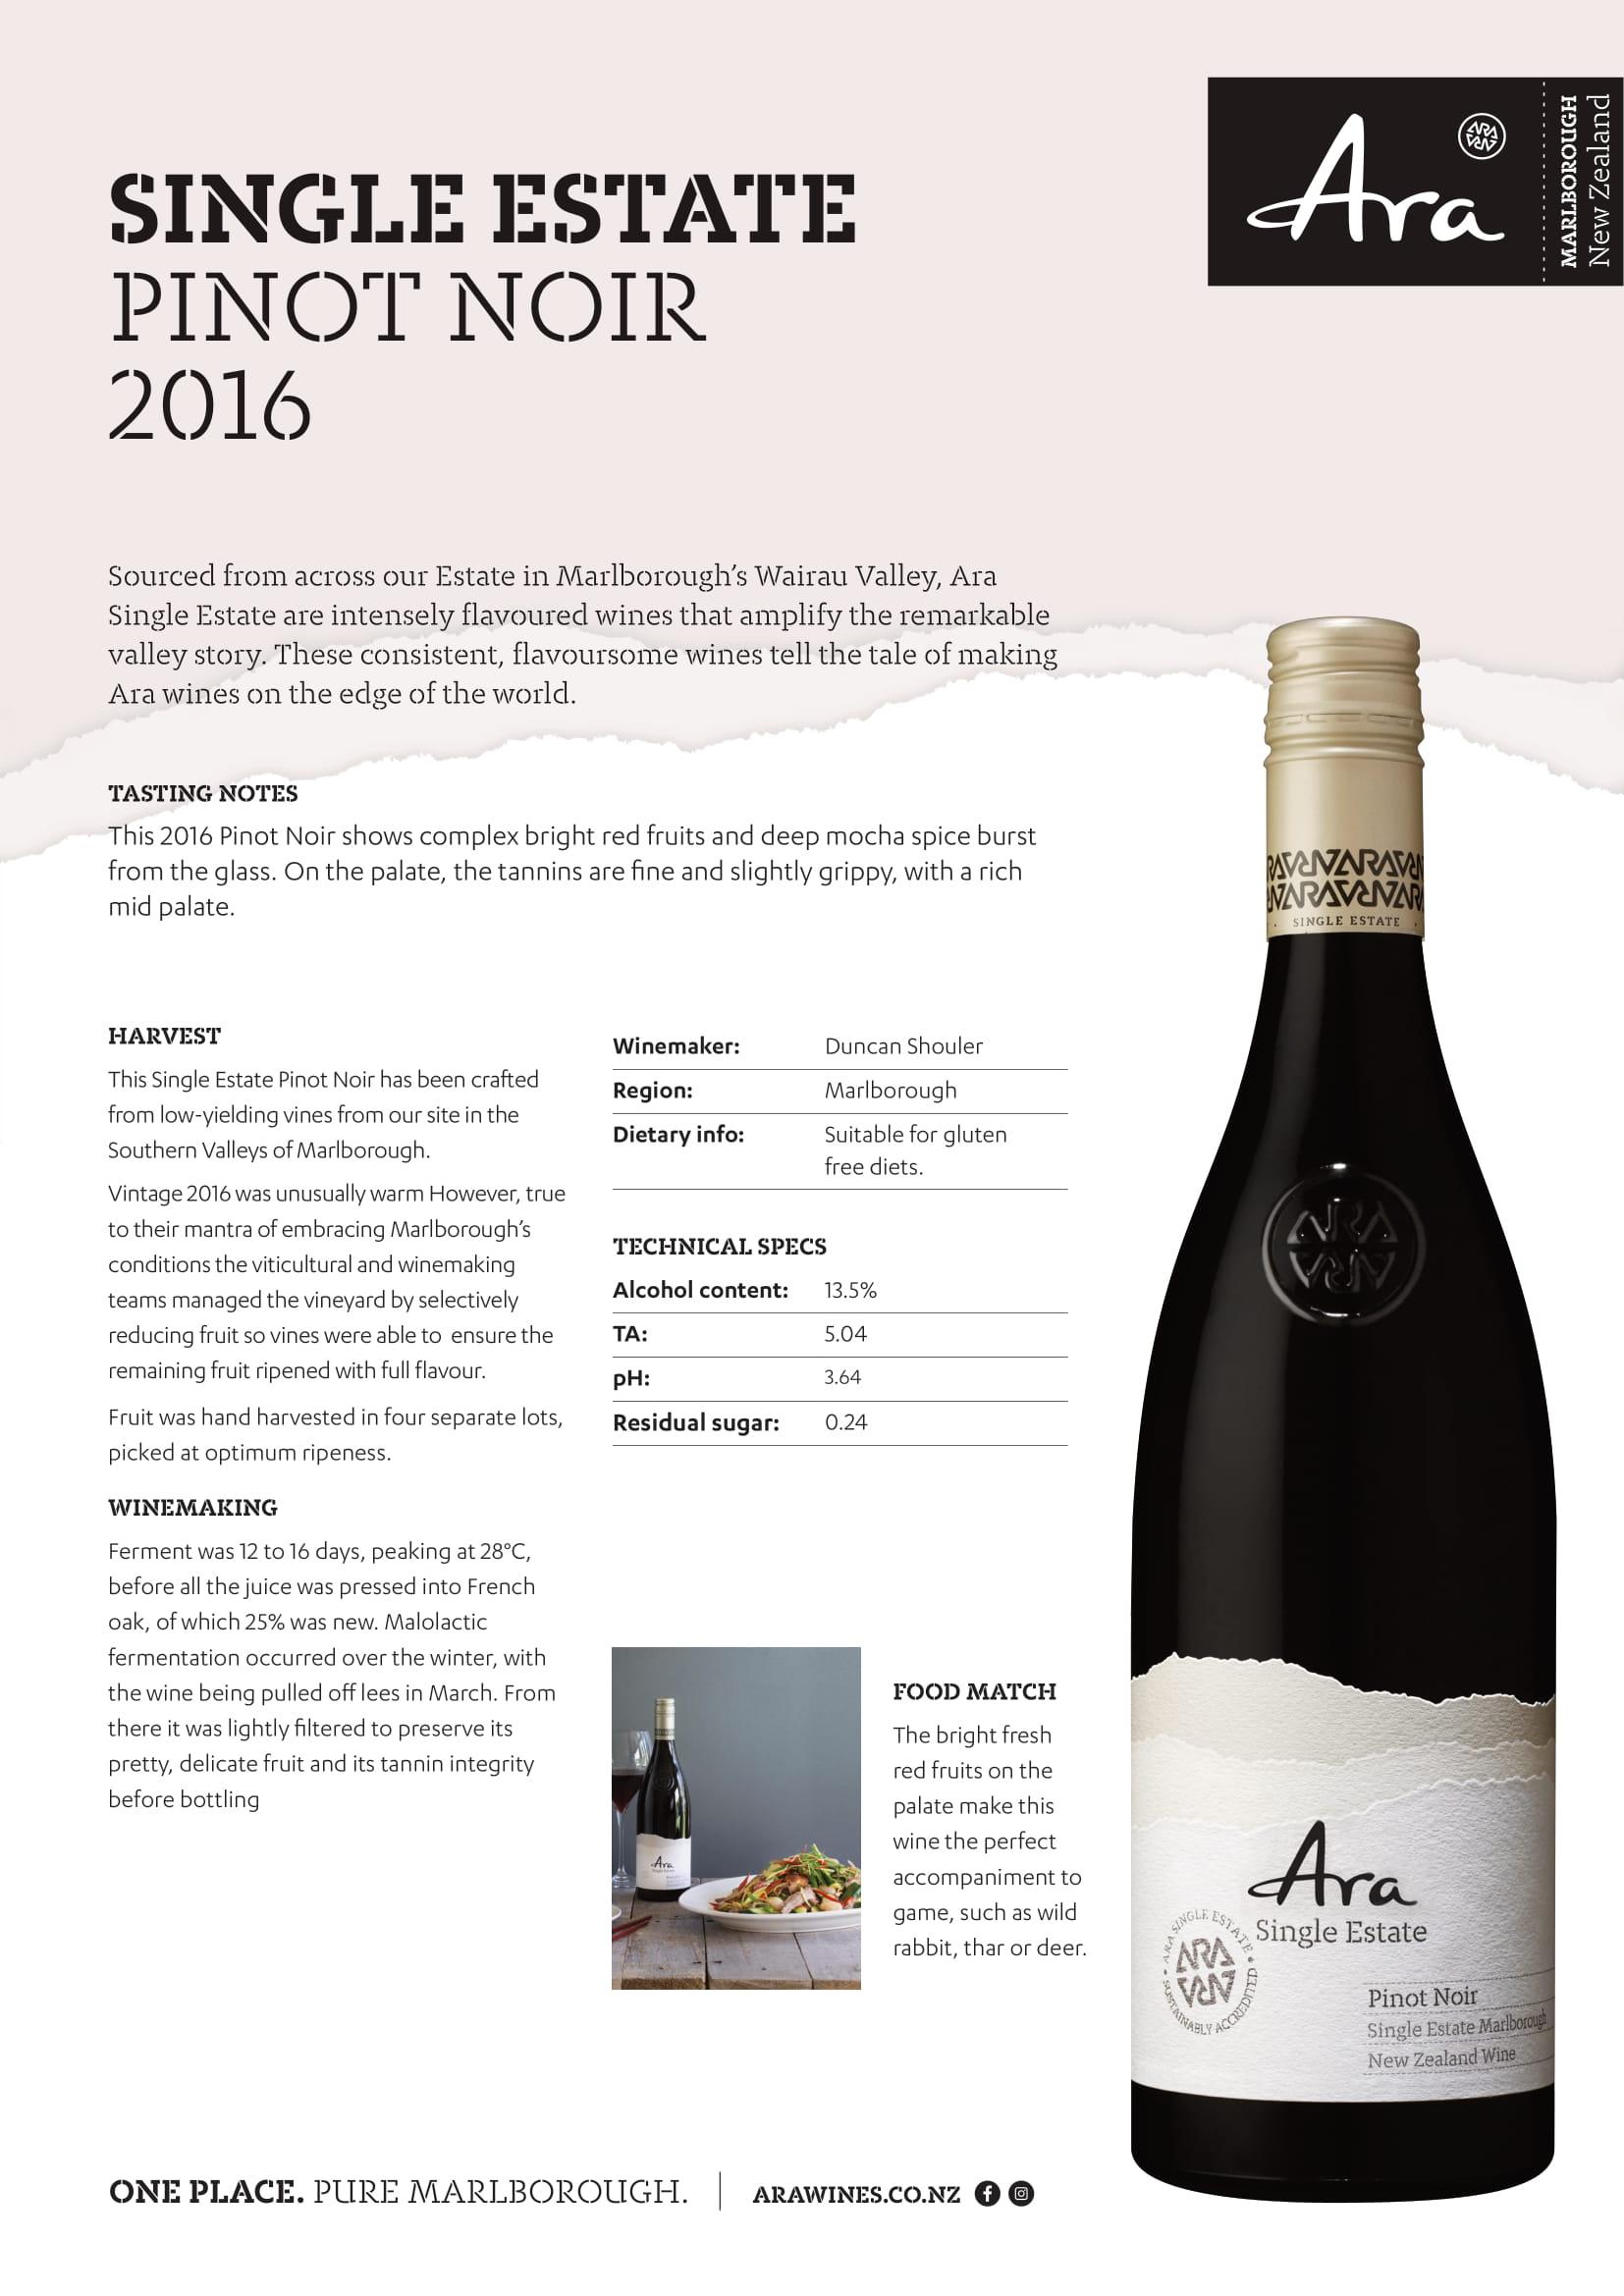 Ara Single Estate Pinot Noir Tech Sheet